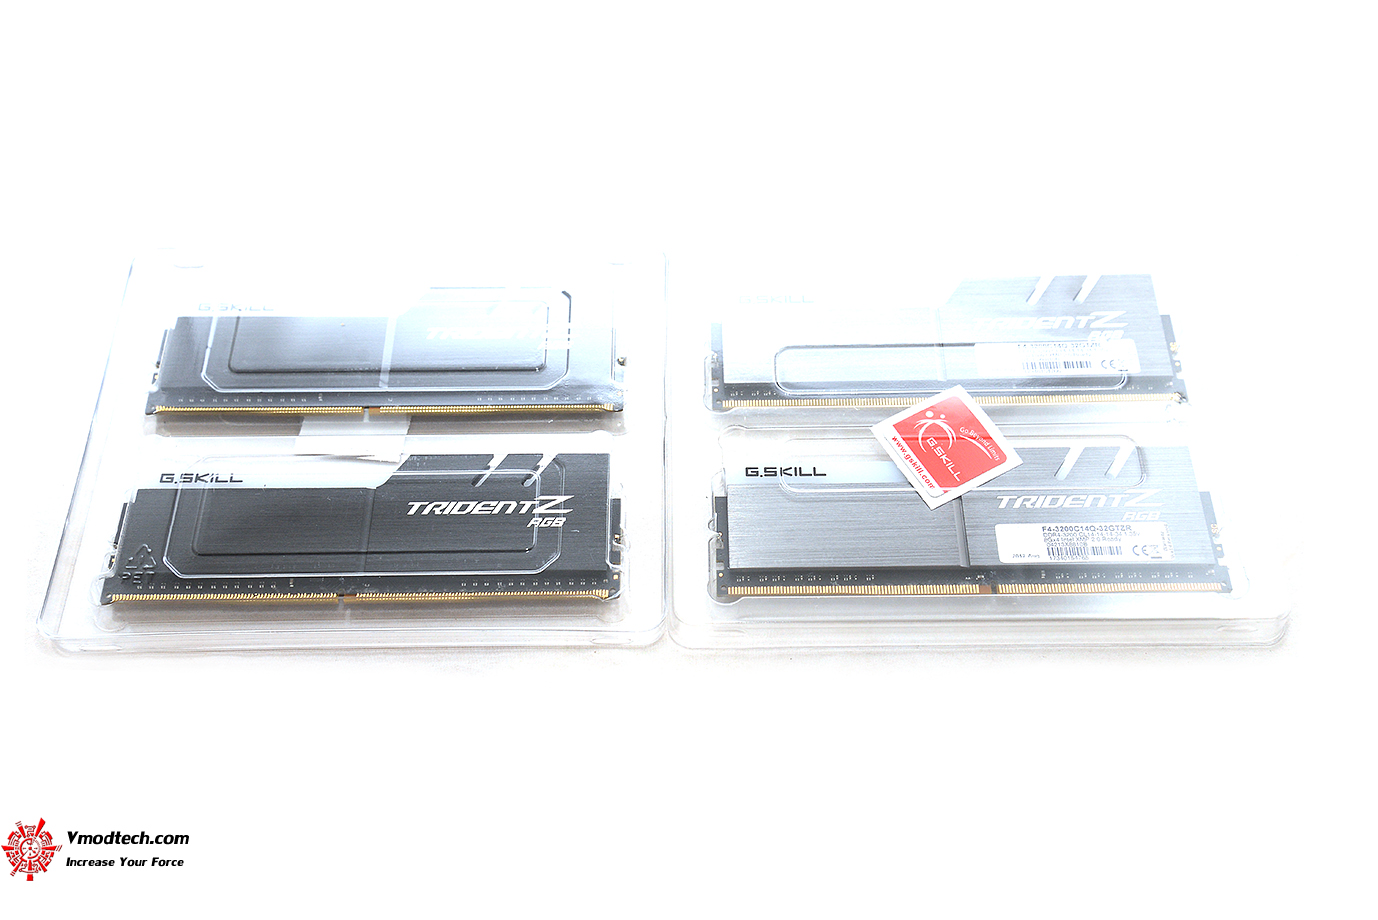 dsc 2907 G.SKILL Trident Z RGB DDR4 3200MHz 32GB (8GBx4) Quad Channel Review